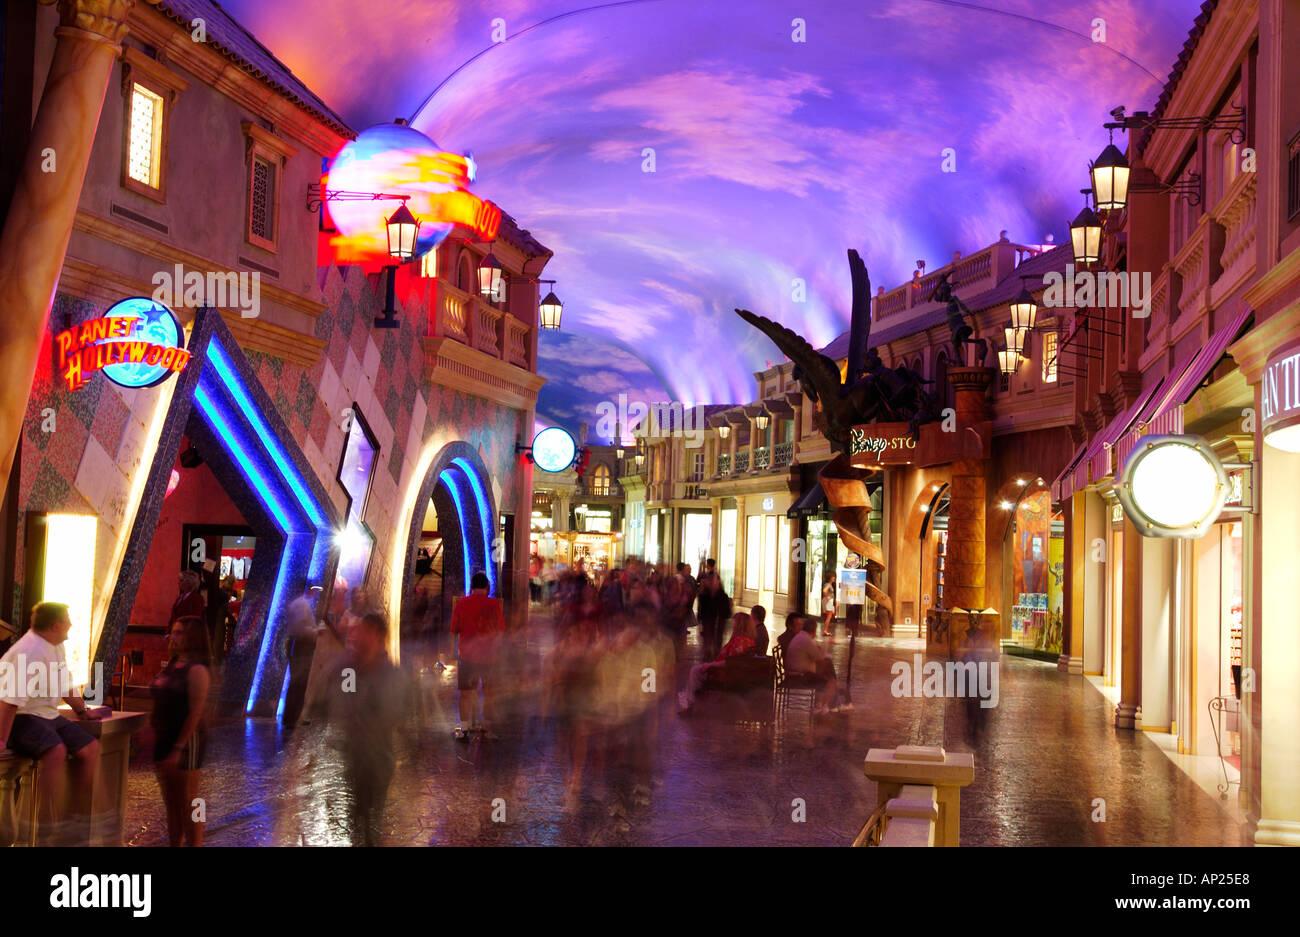 Forum Shops at Caesars Palace Las Vegas - Stock Image